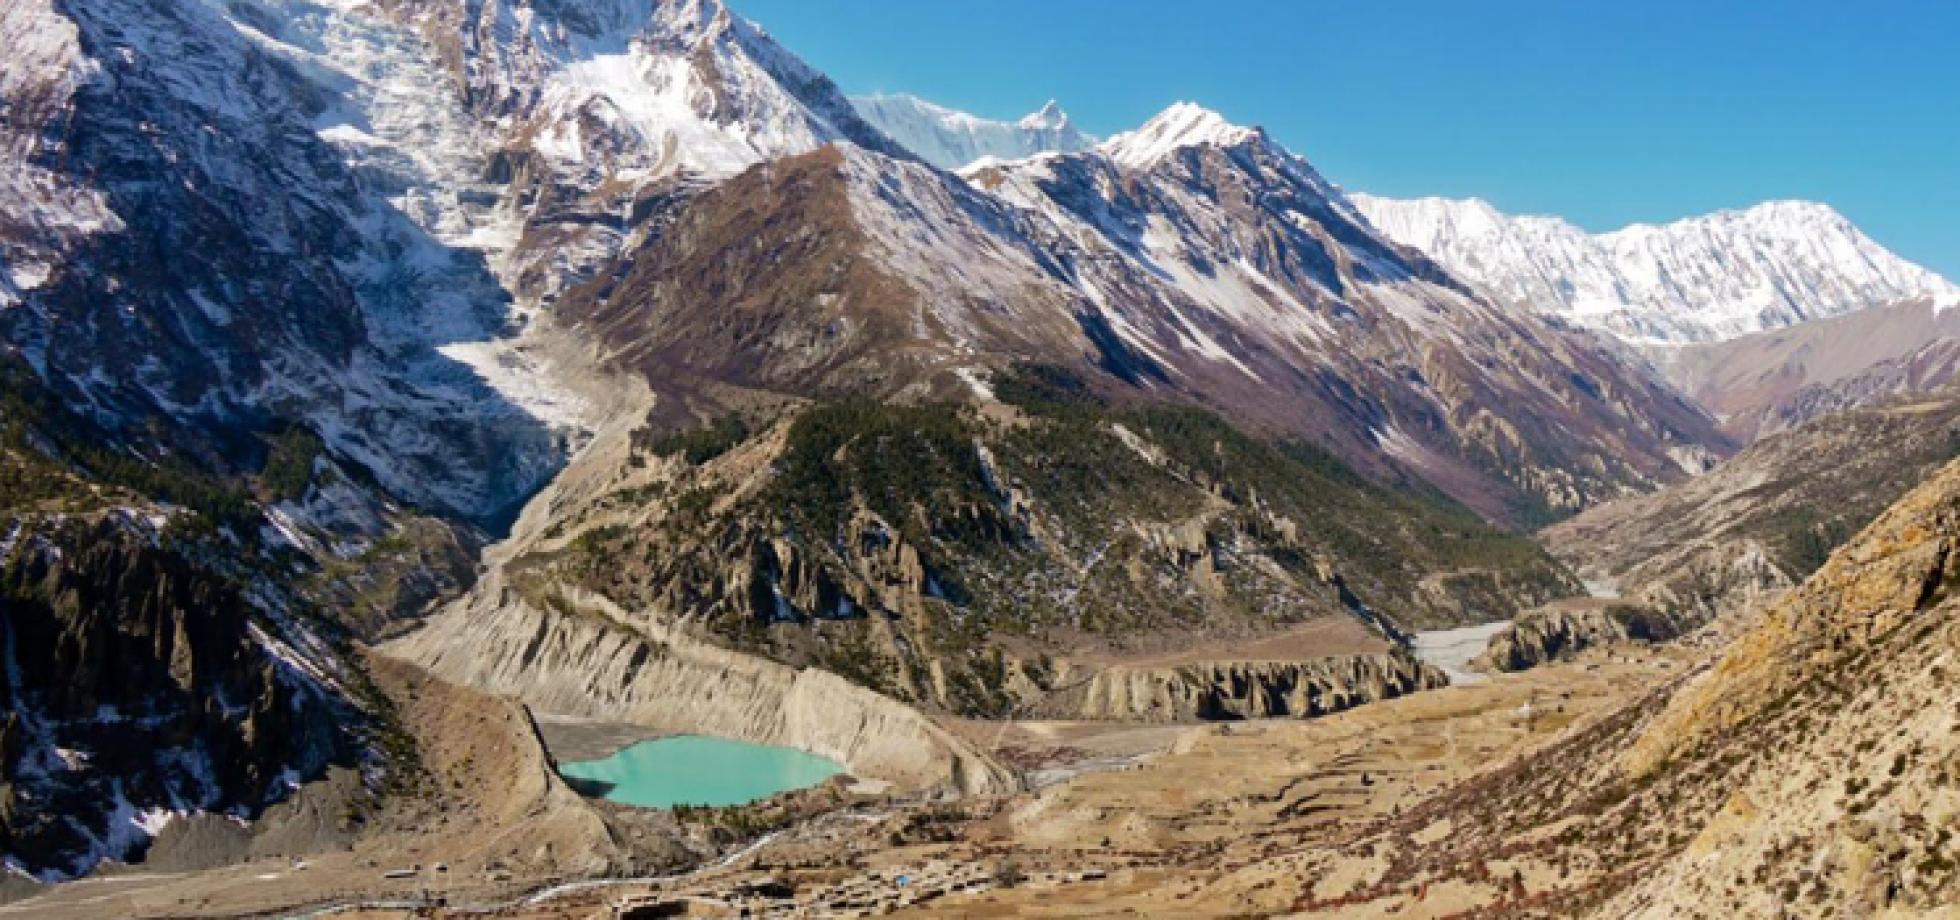 Annapurna treks for a remote trekking adventure 2017.